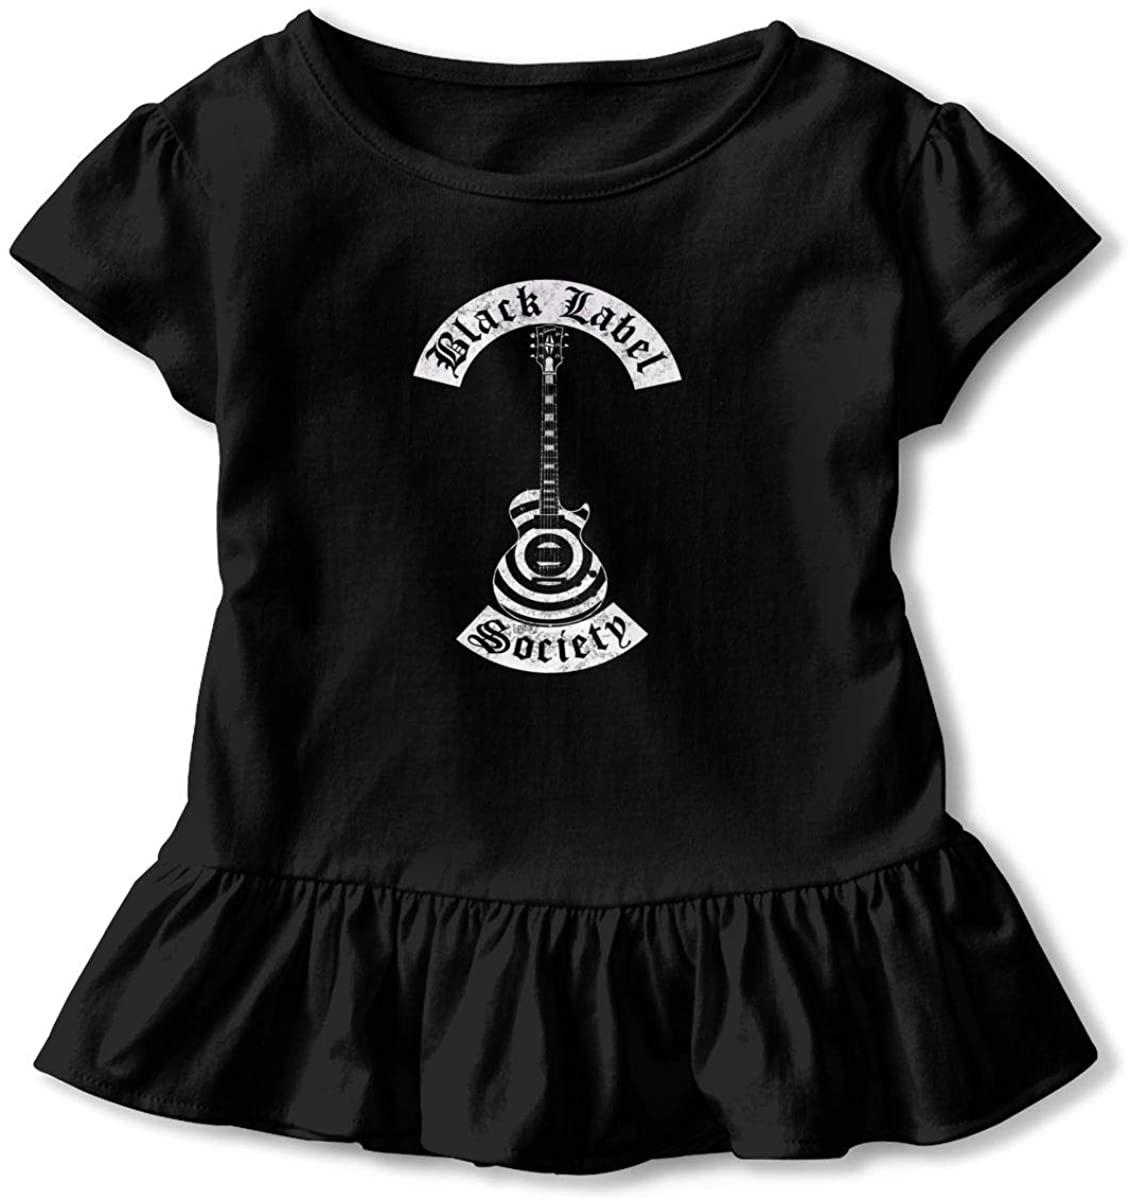 Black Label Society Toddler Girls Ruffle T-Shirt Short Sleeve 2-6t